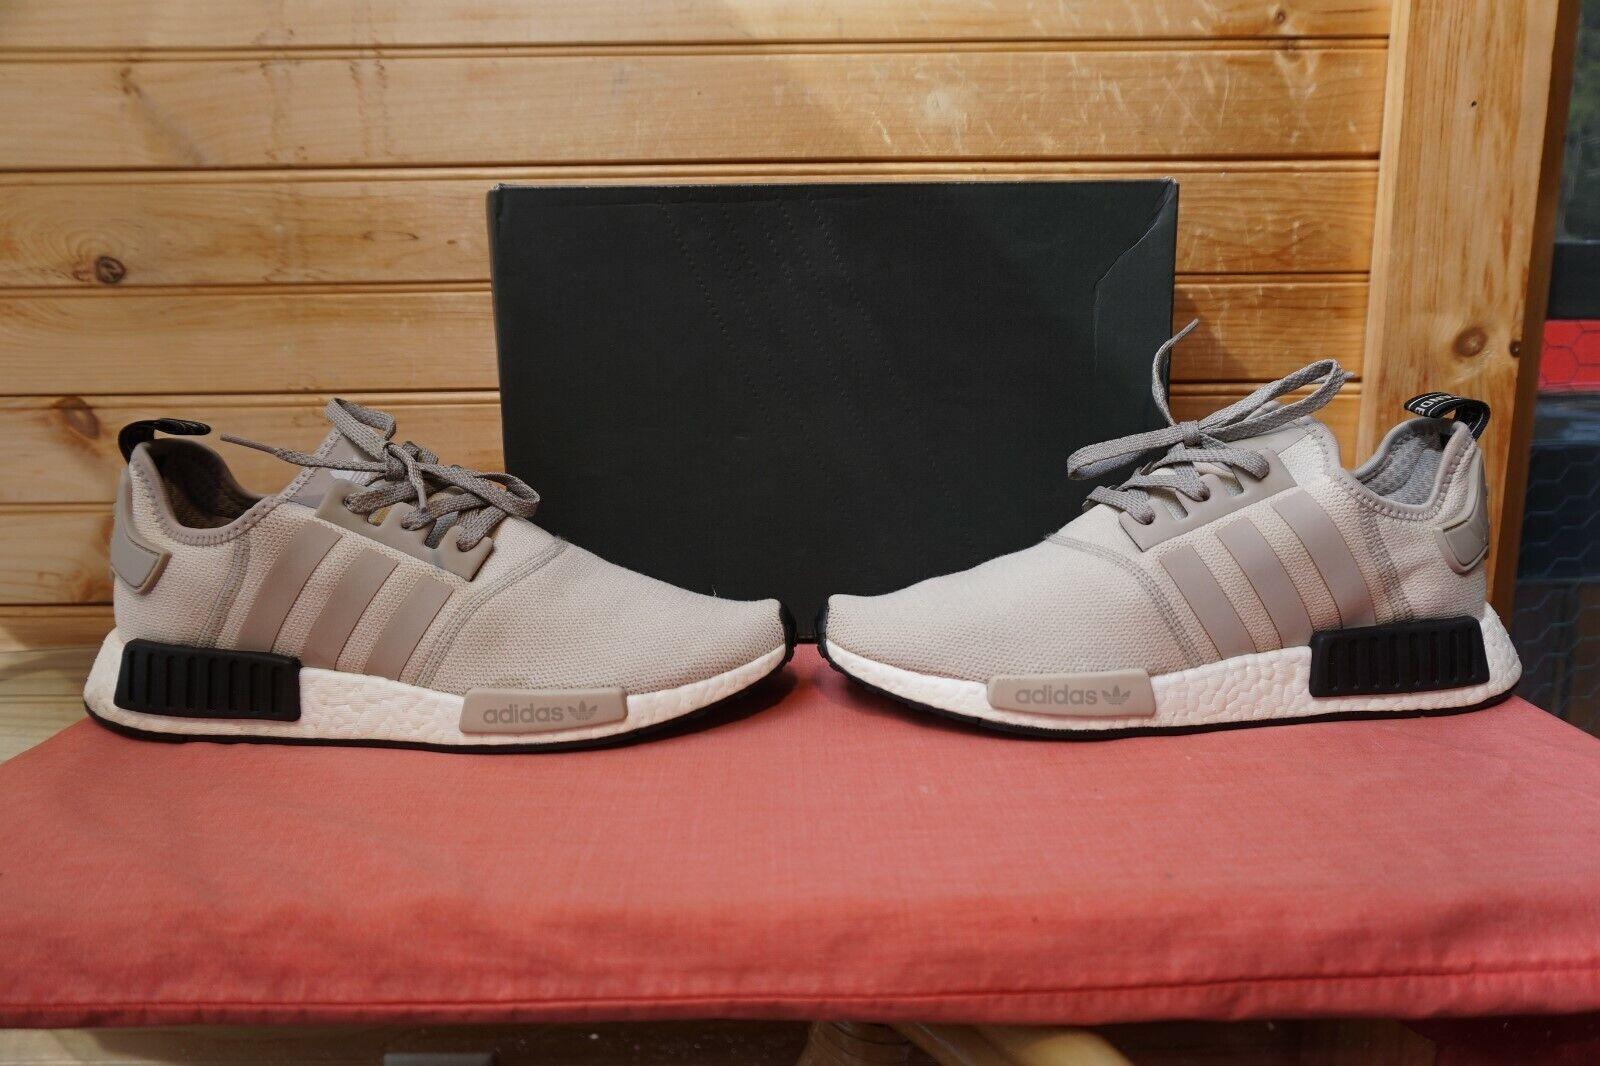 2016 Adidas NMD_R1  Cream White White White Core Black  Sz 11 (1287) S76848 a96e19